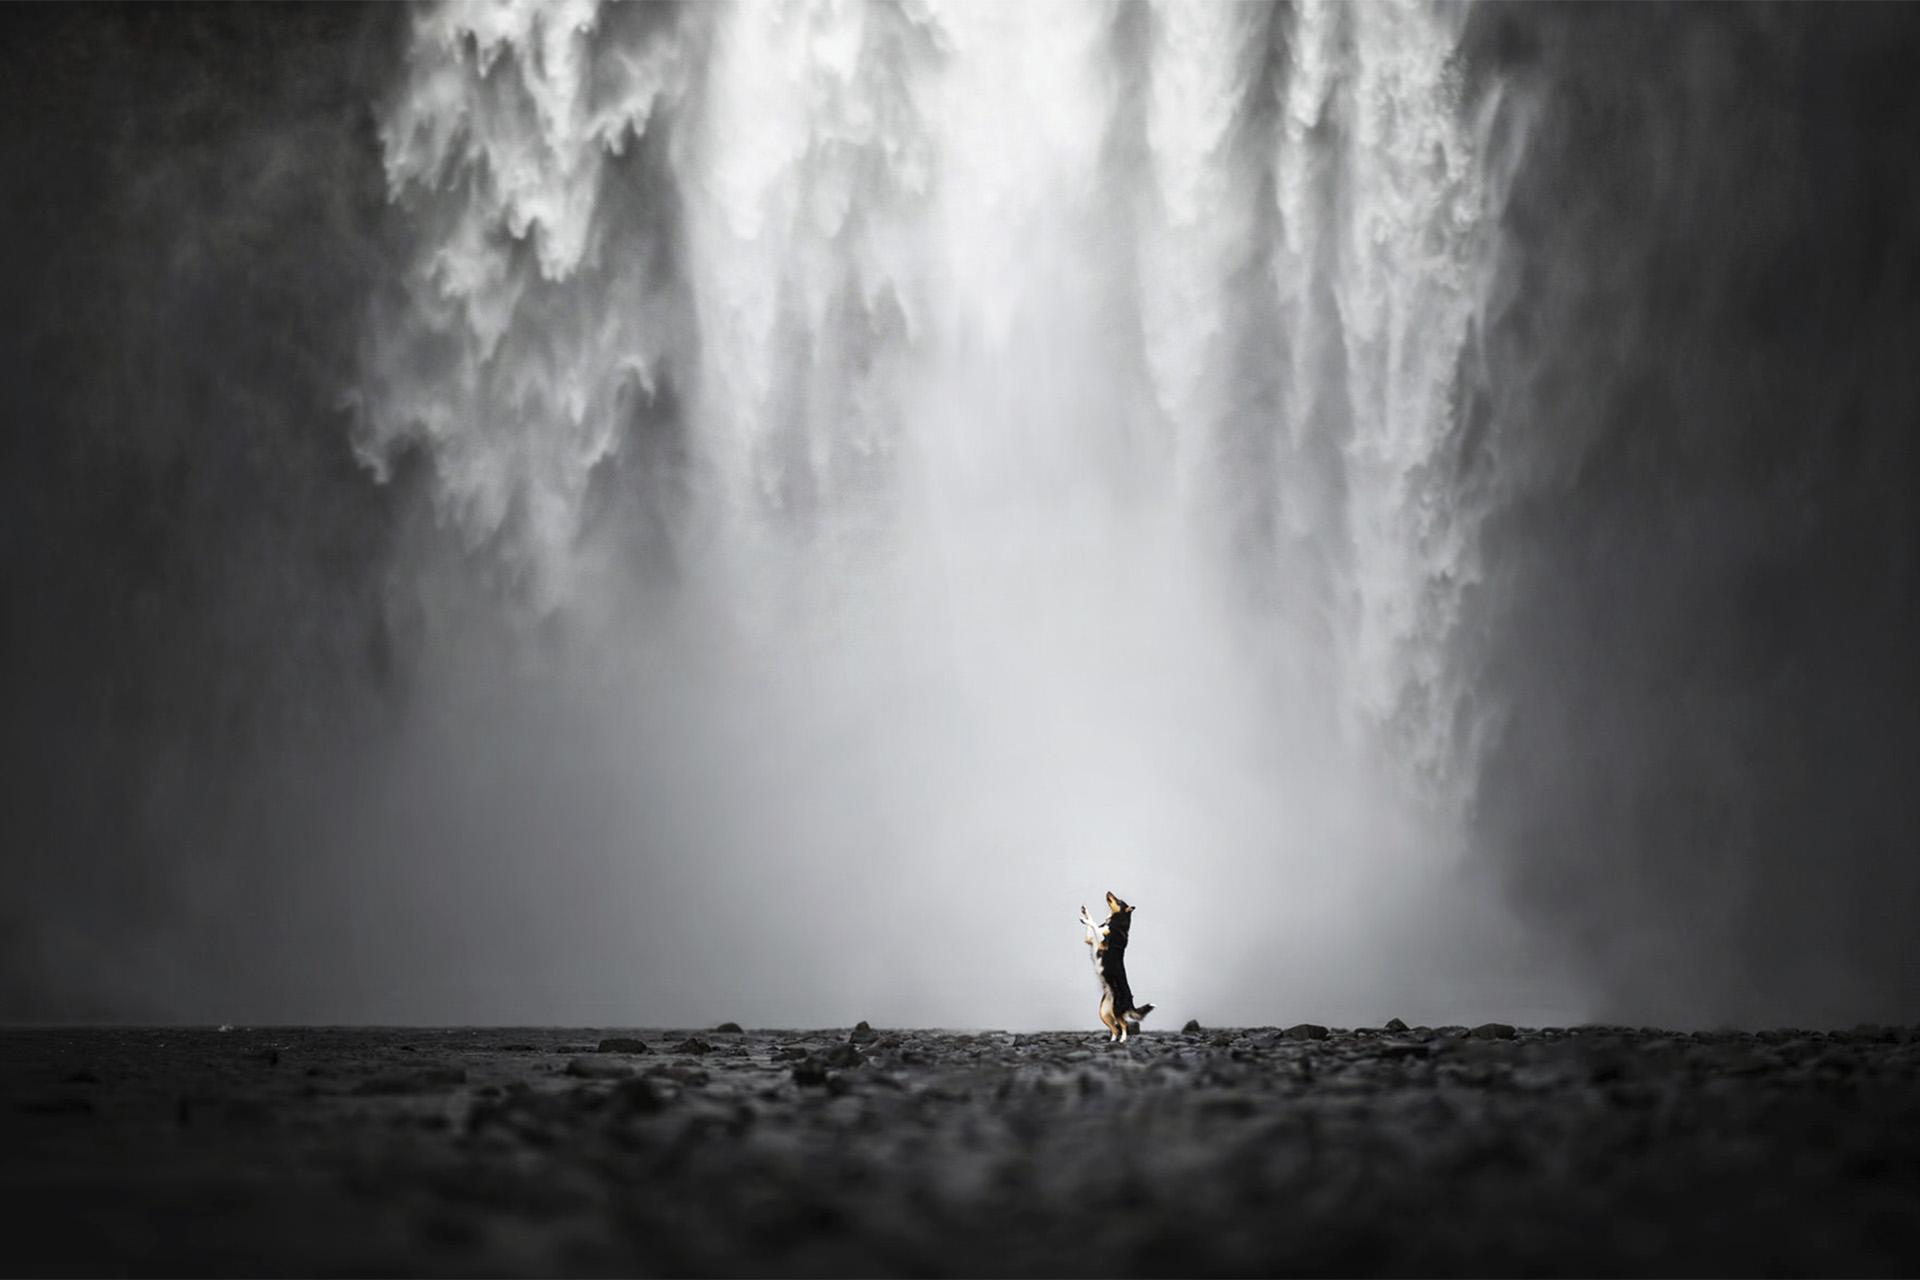 Dog_waterfall